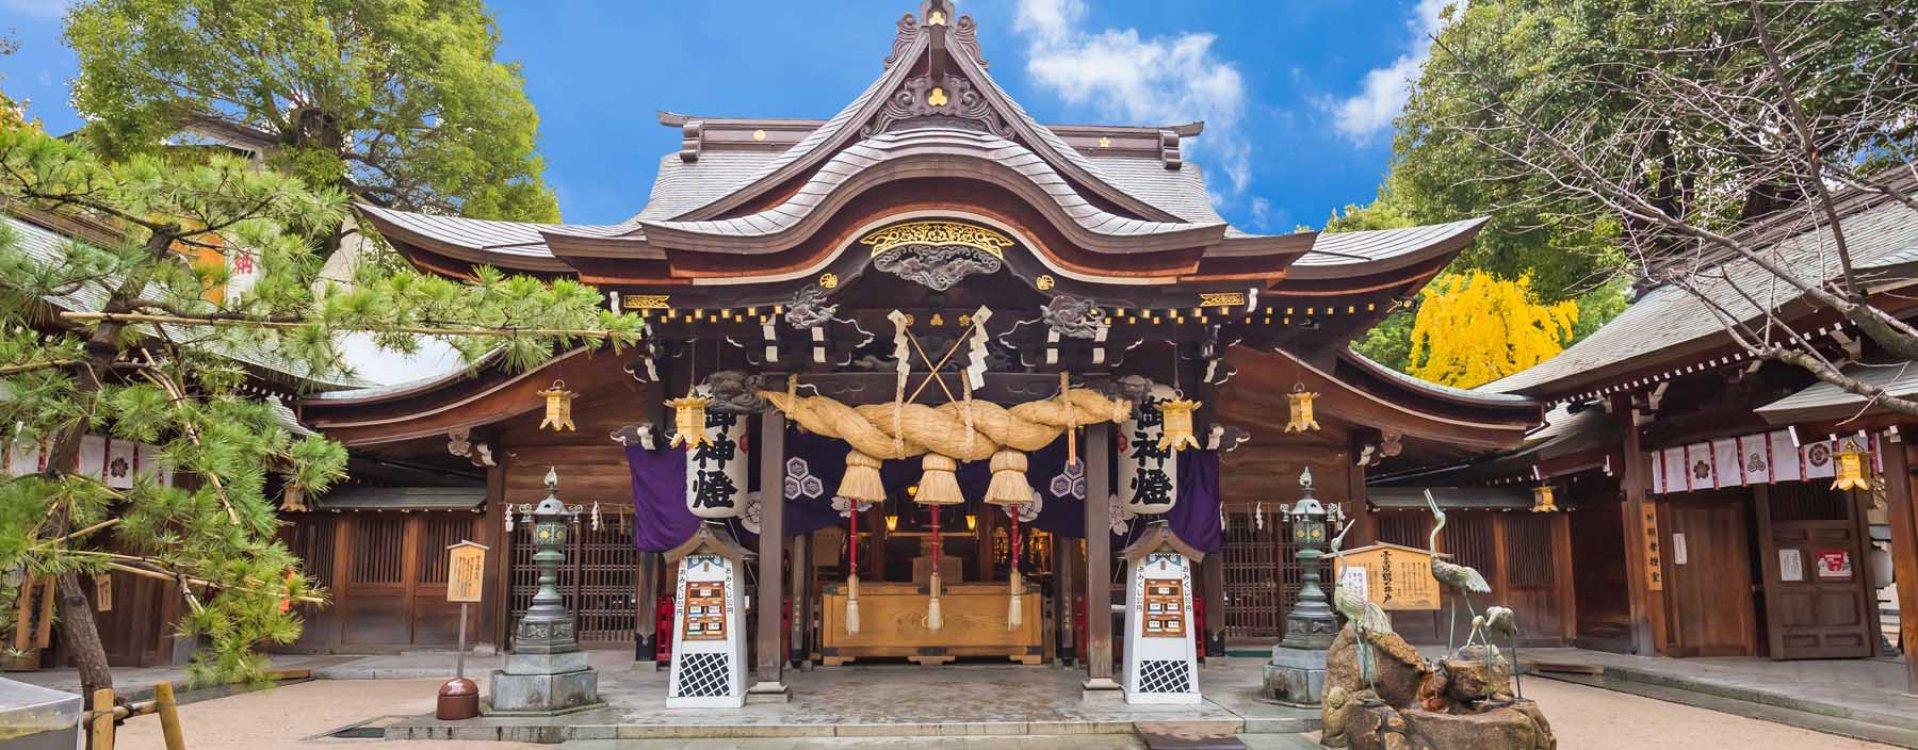 Tocho-ji tempel in Fukuoka